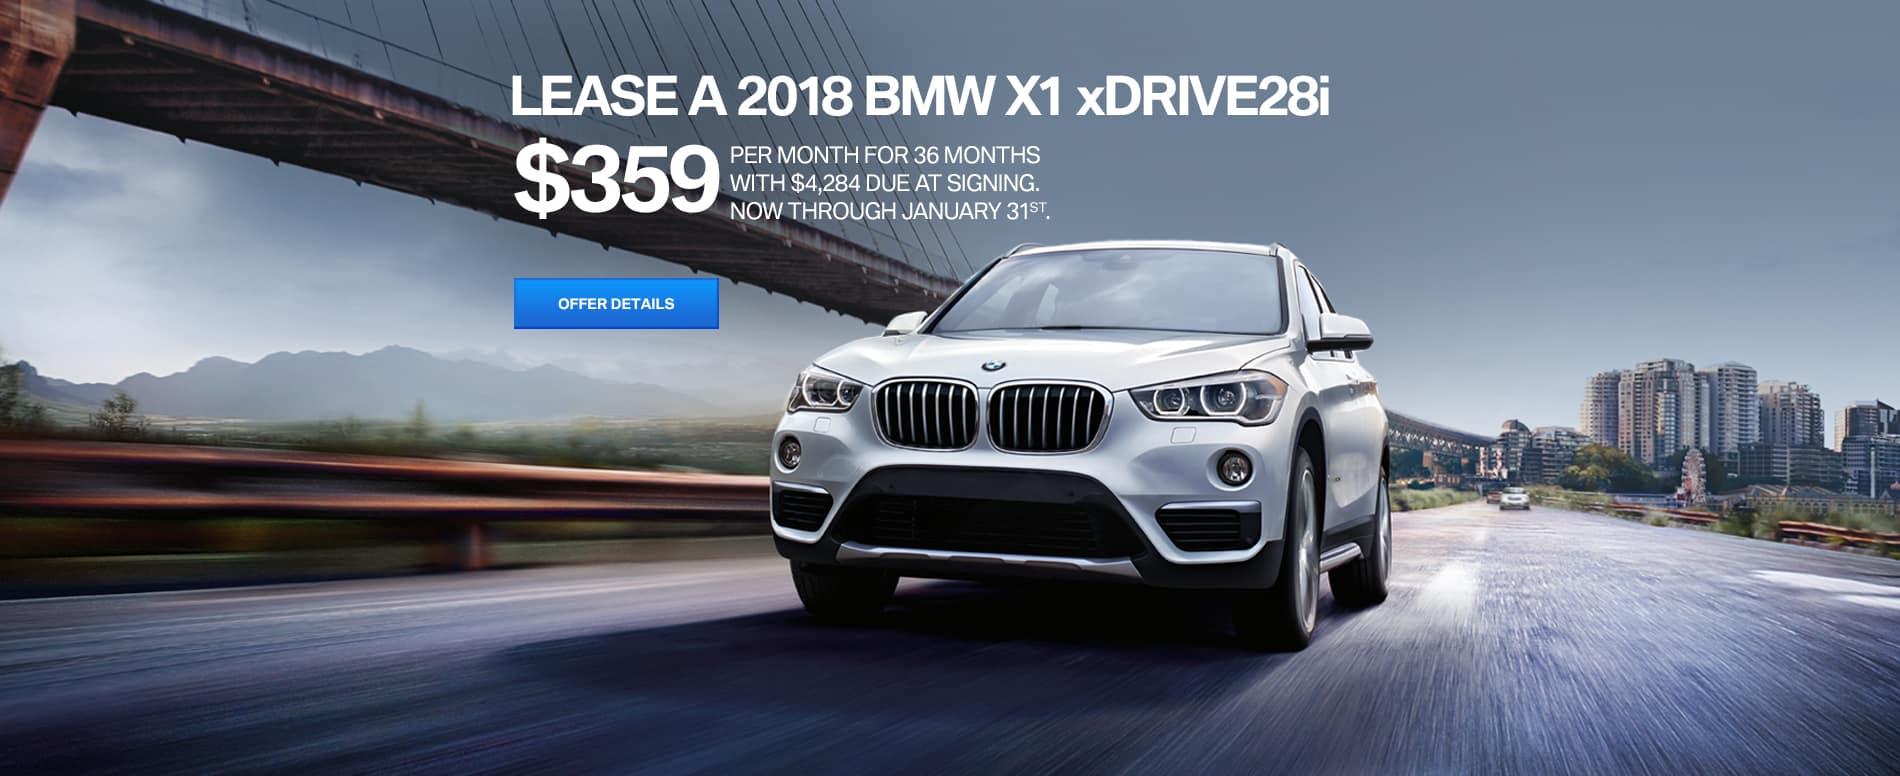 PUSH_2018_X1_xDrive28i_$359